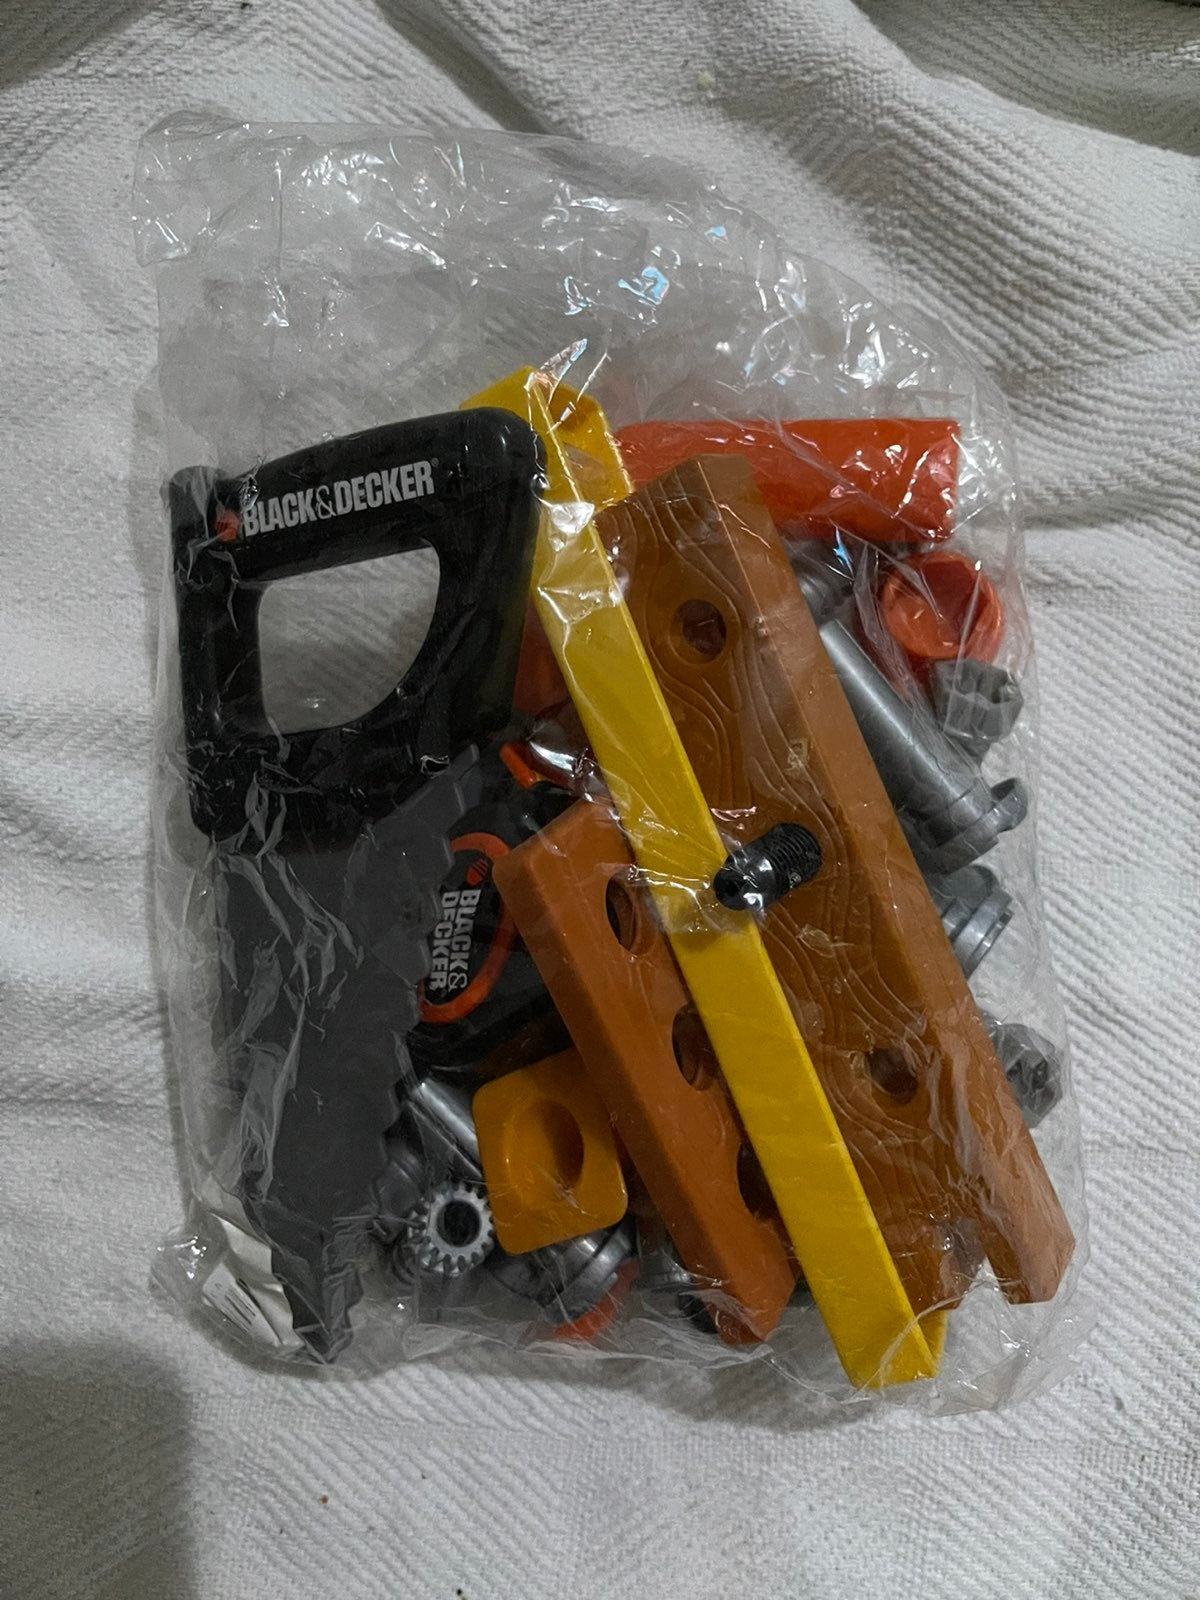 Black & Dexter Tool bundle